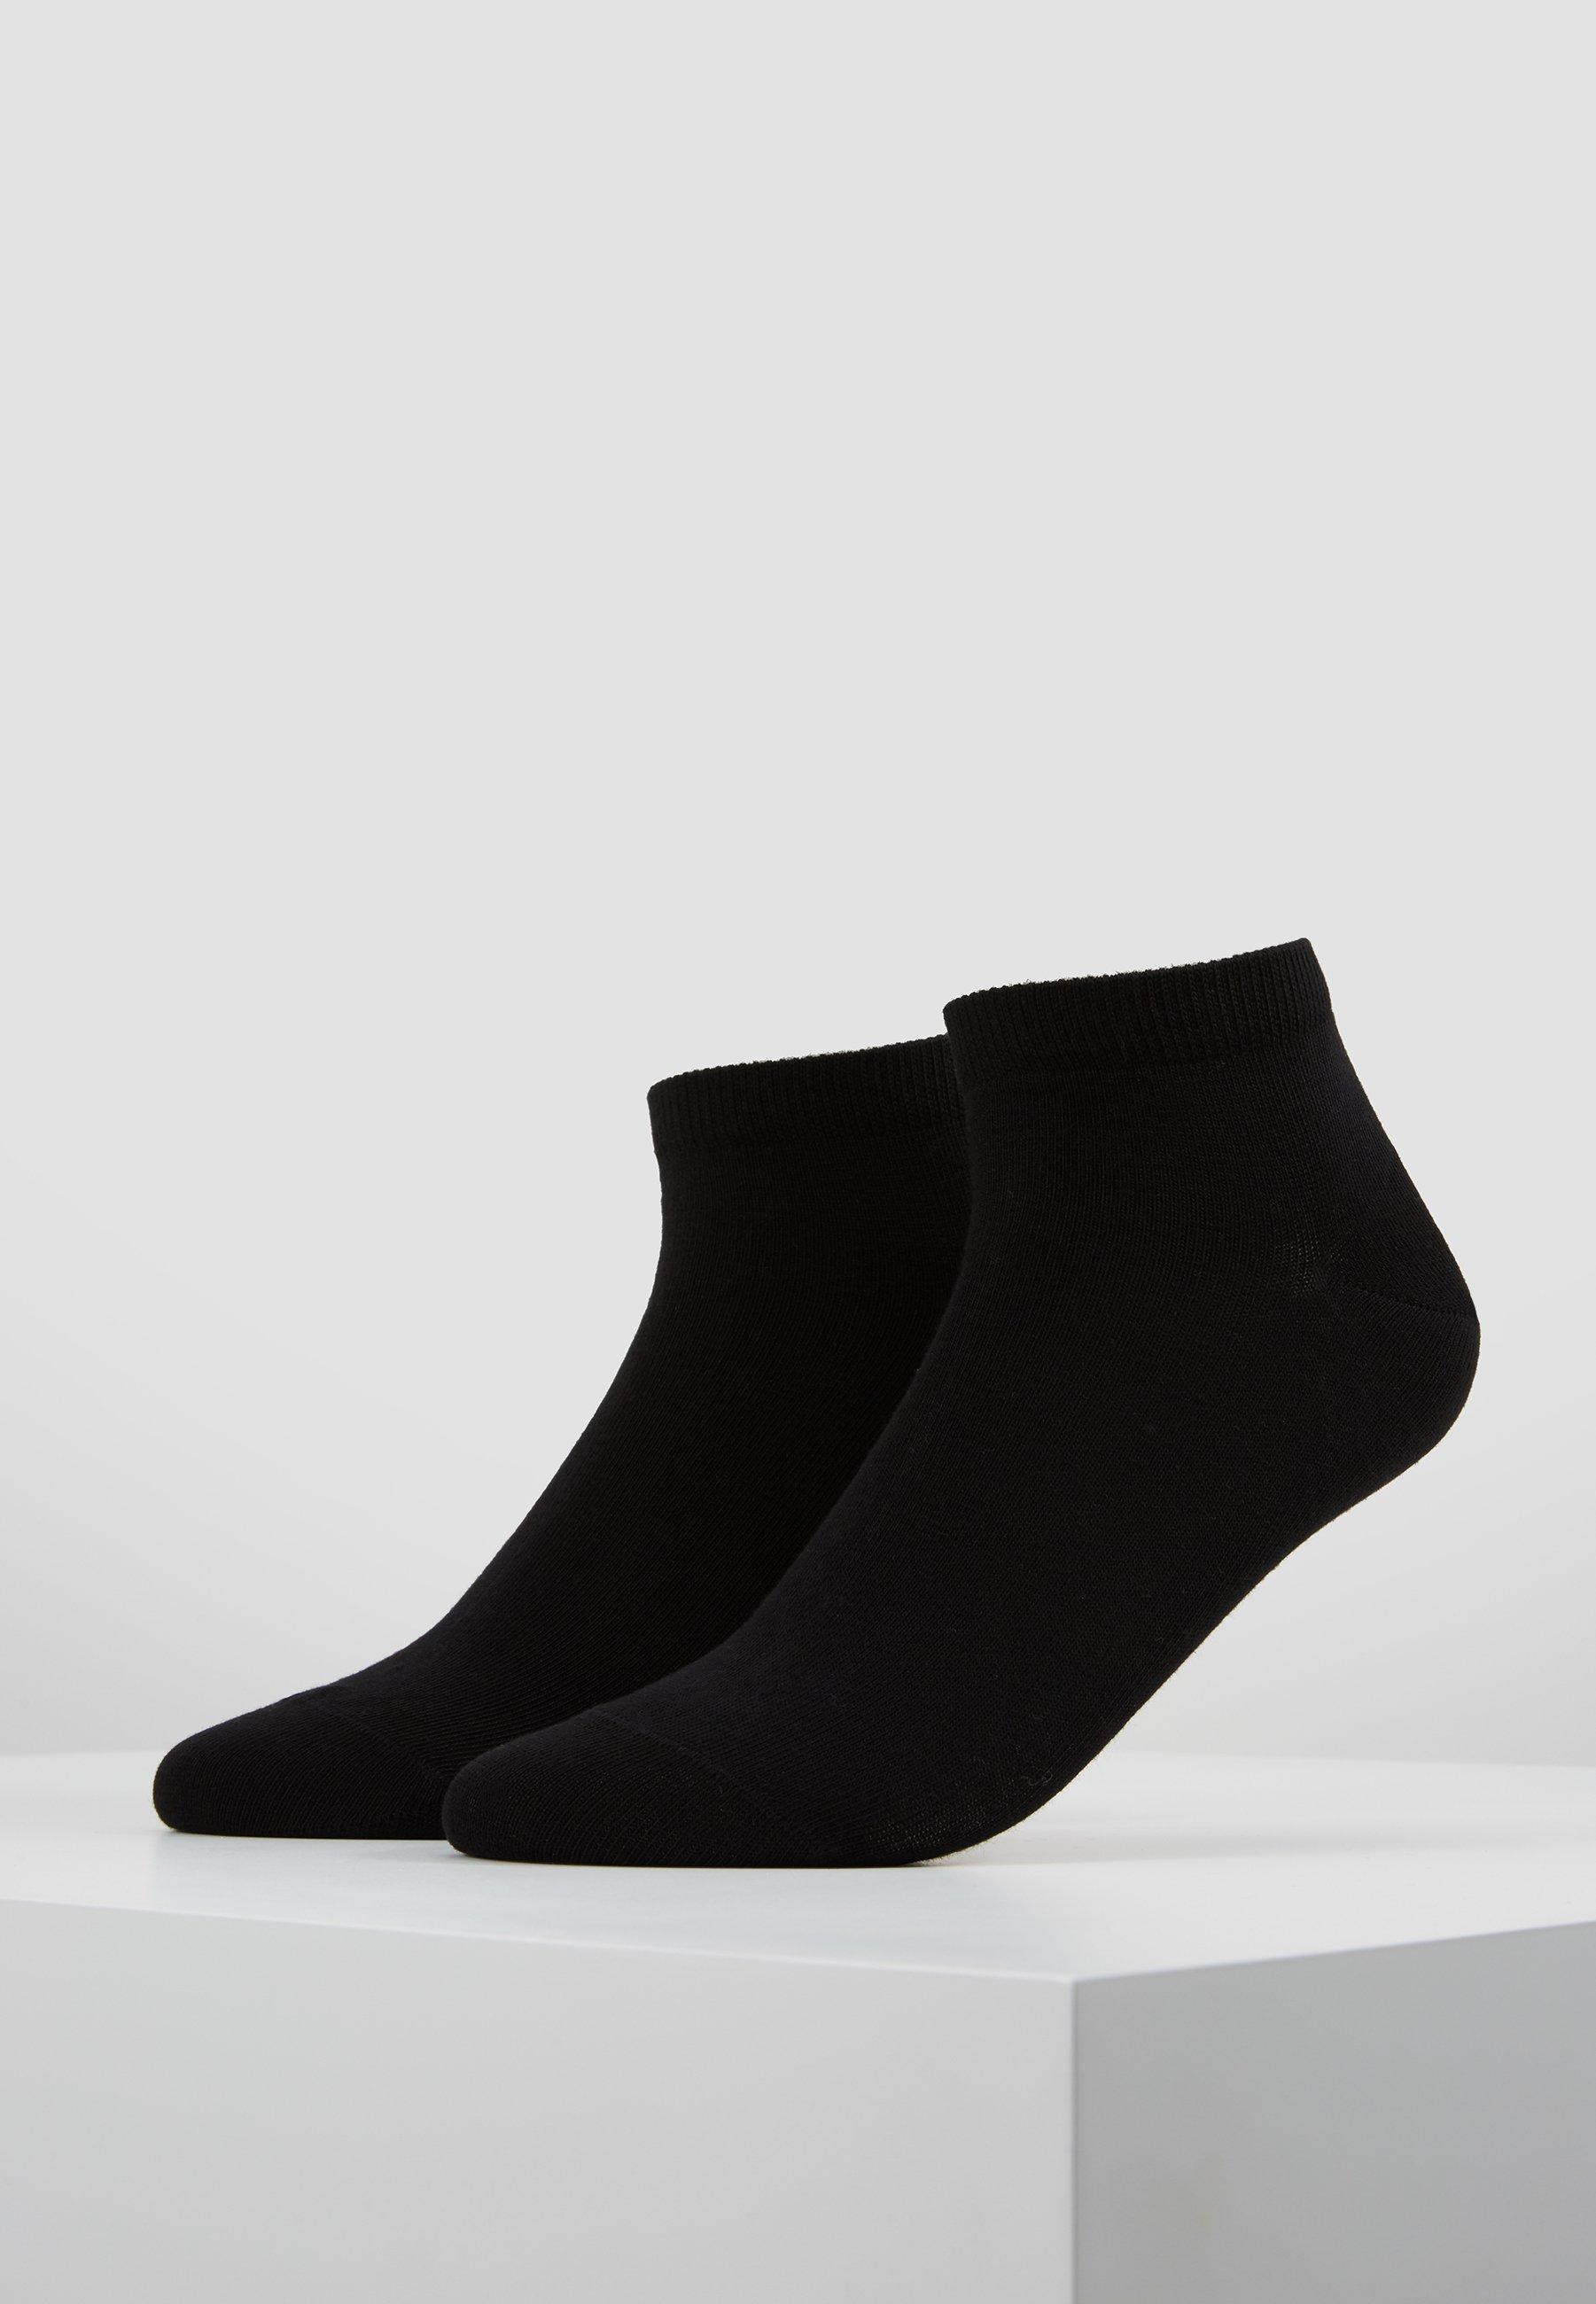 Men HAPPY 2-PACK SNEAKER - Socks - black